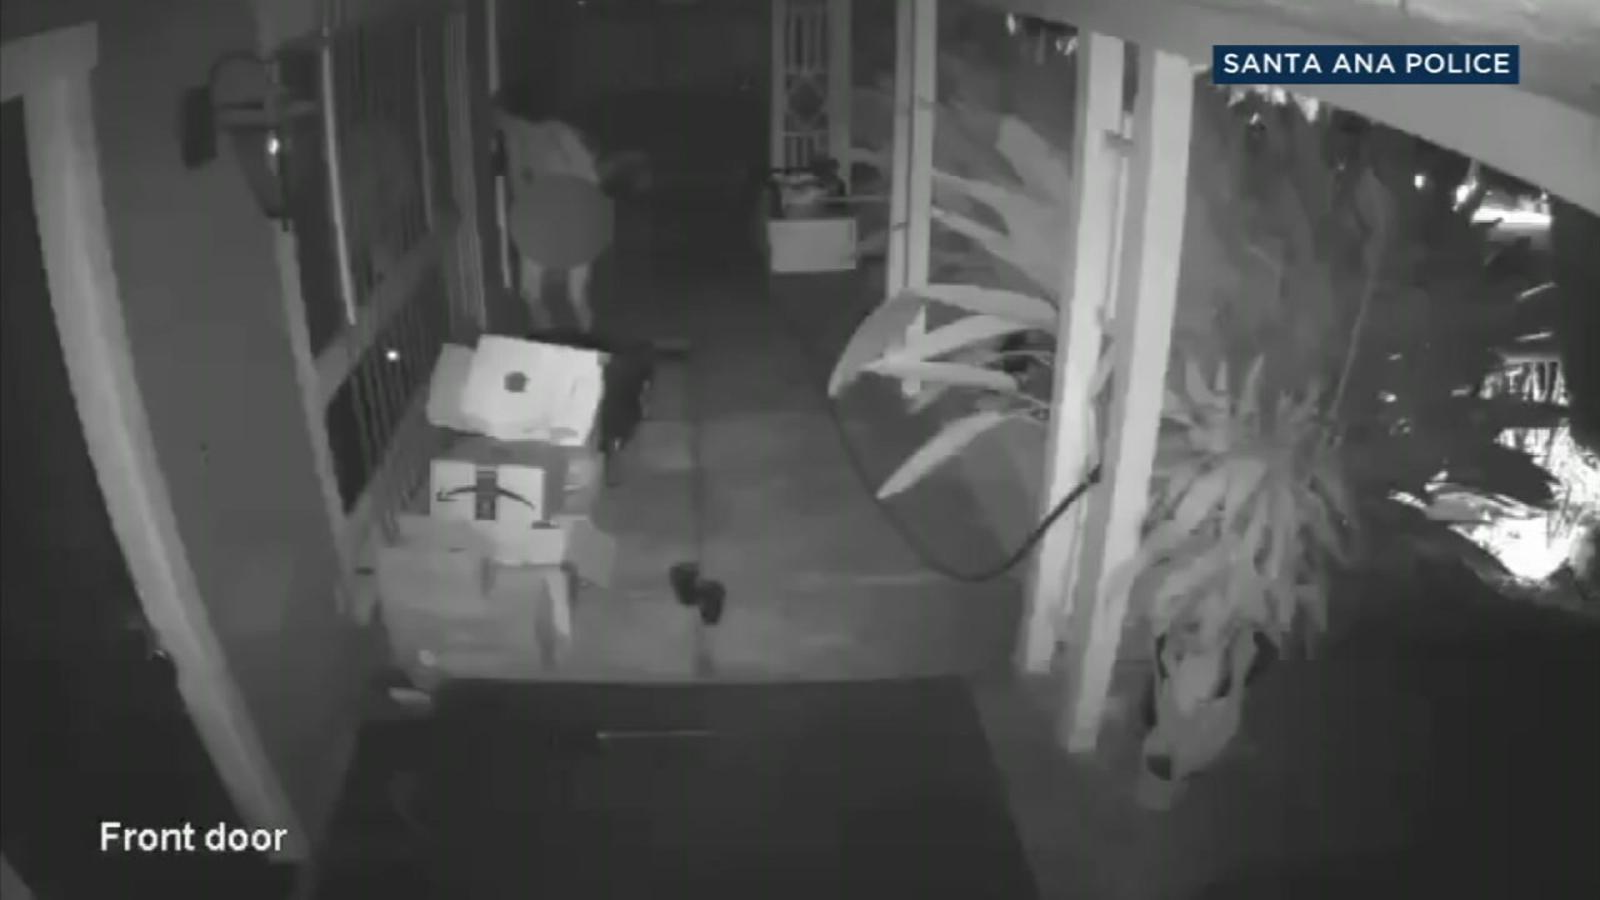 Naked prowler caught masturbating on surveillance video sought in Santa Ana